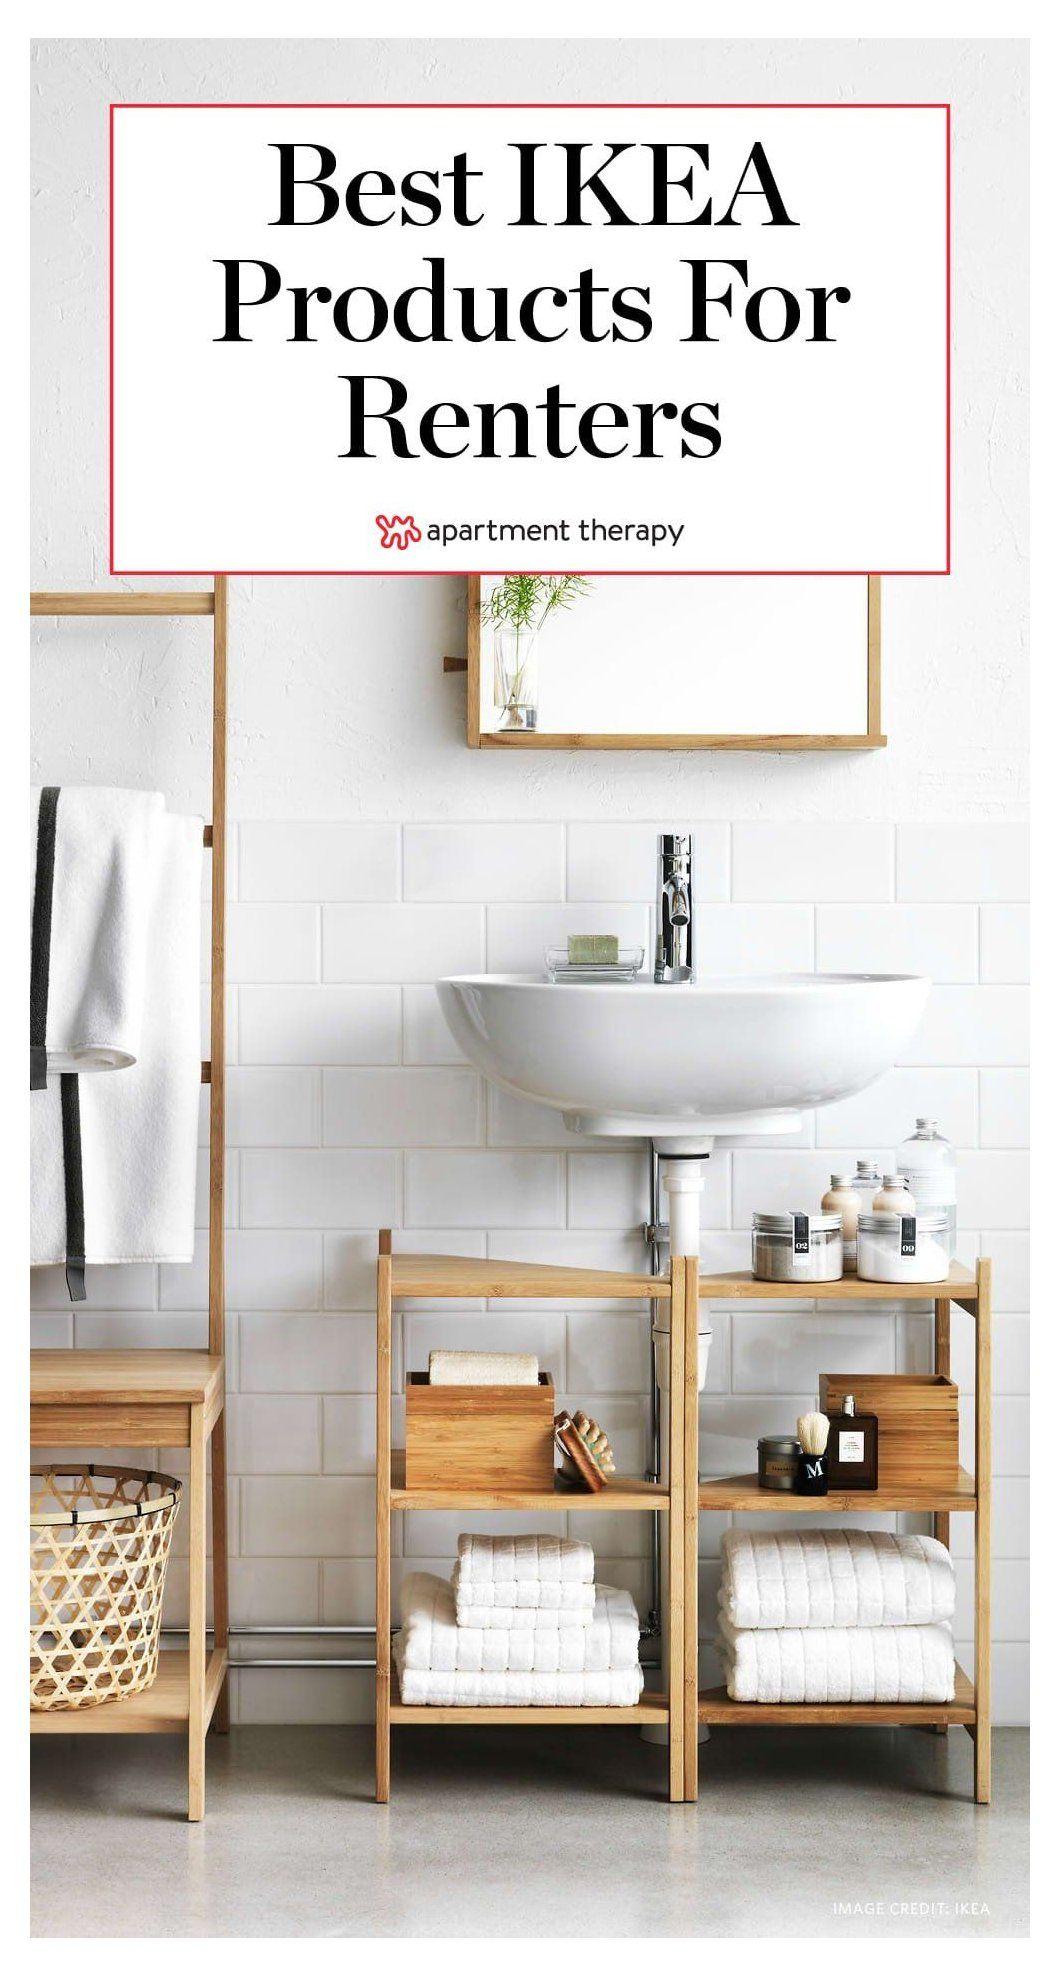 50 Smart Hidden Storage Ideas For Small Spaces This Year Epicdeco 272104 Hidden Storage Ideas Hiddenstor In 2020 Ikea Small Bathroom Furniture Unique Bathroom